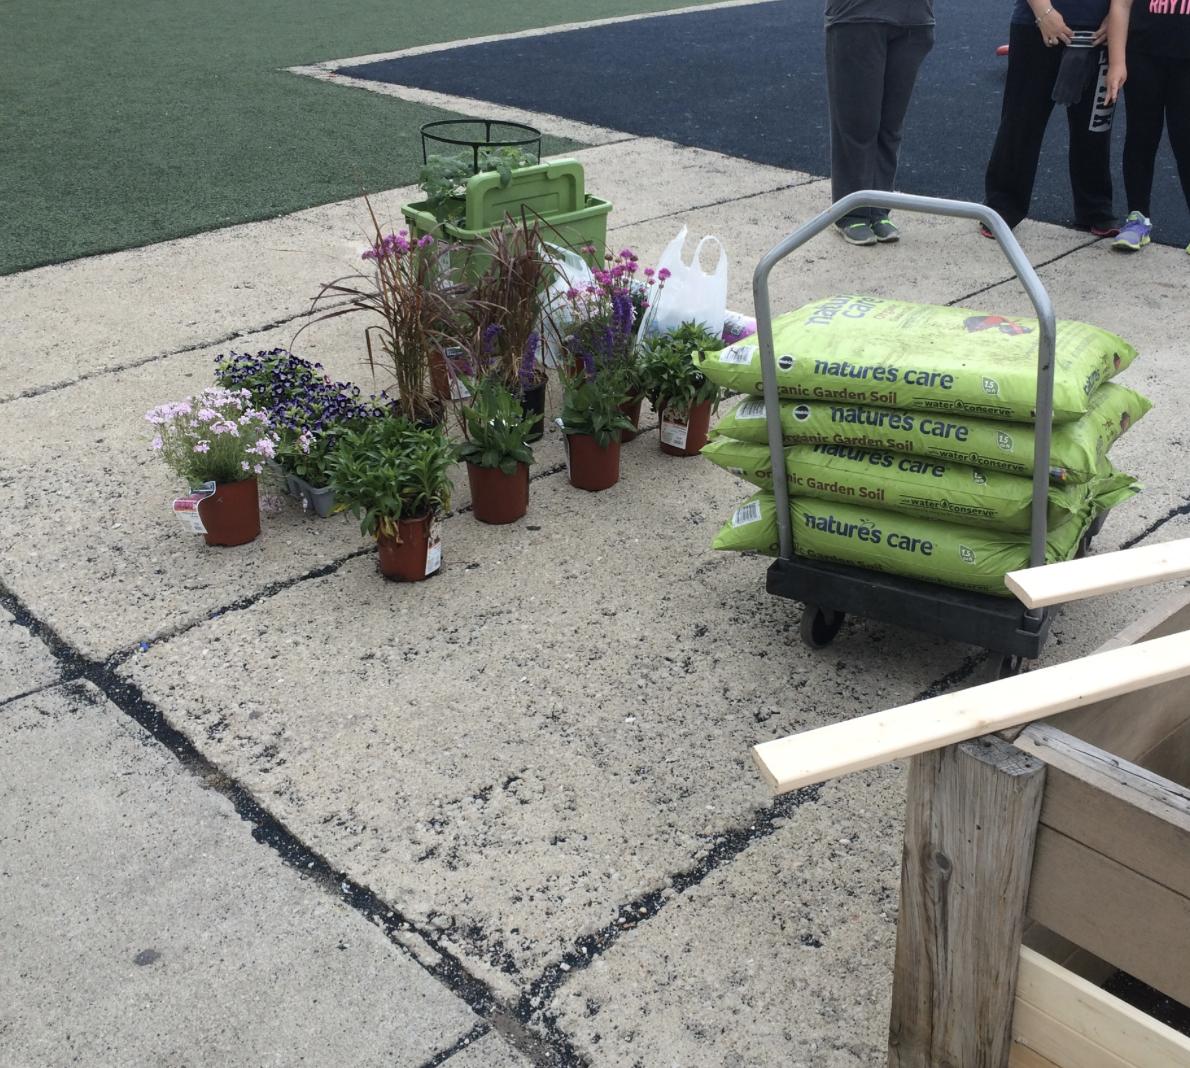 June 18, 2015 Swift Garden Clean-Up